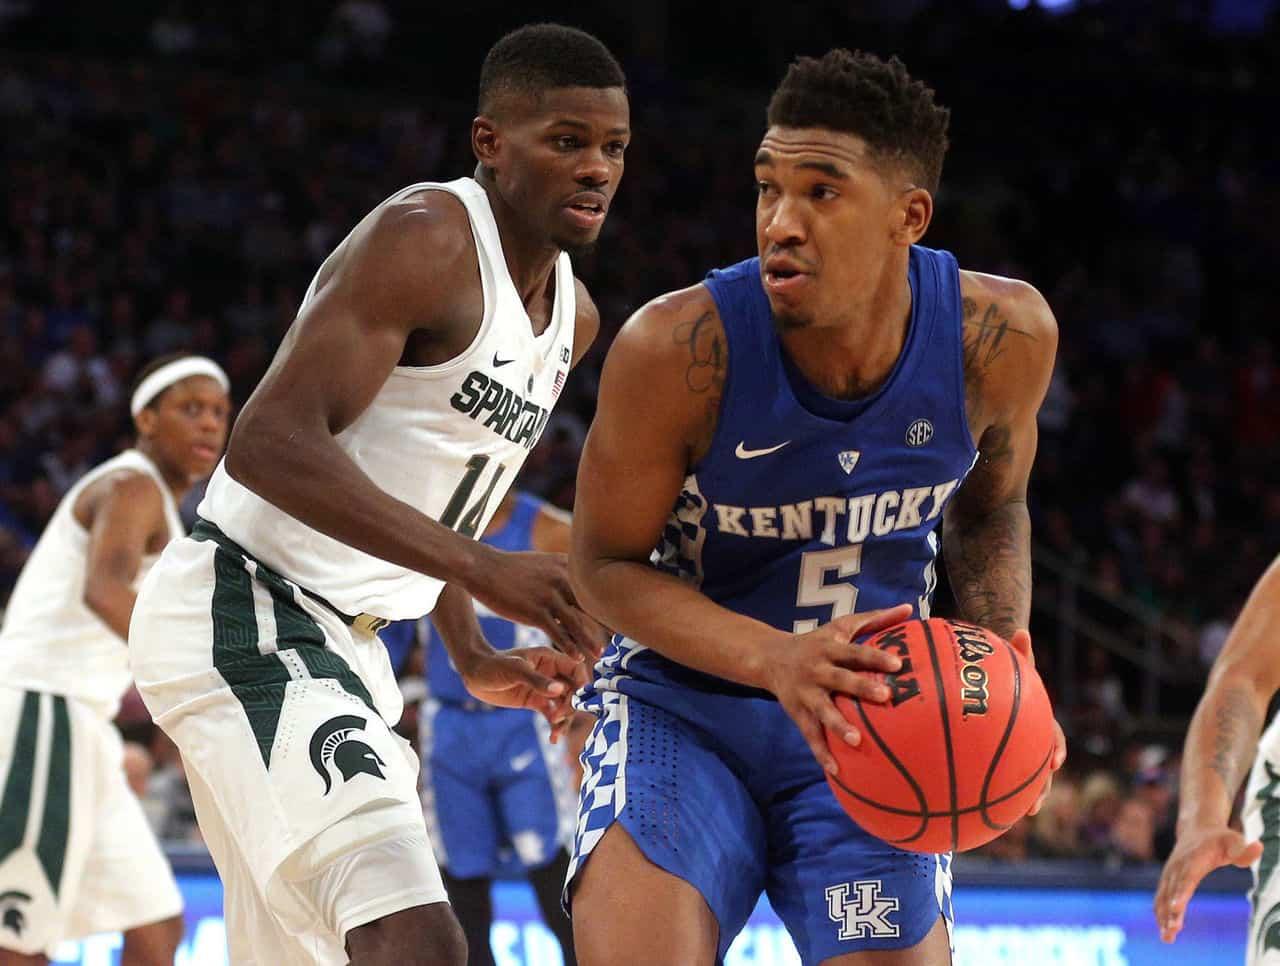 Kentucky extralusso, poi Kansas batte Duke